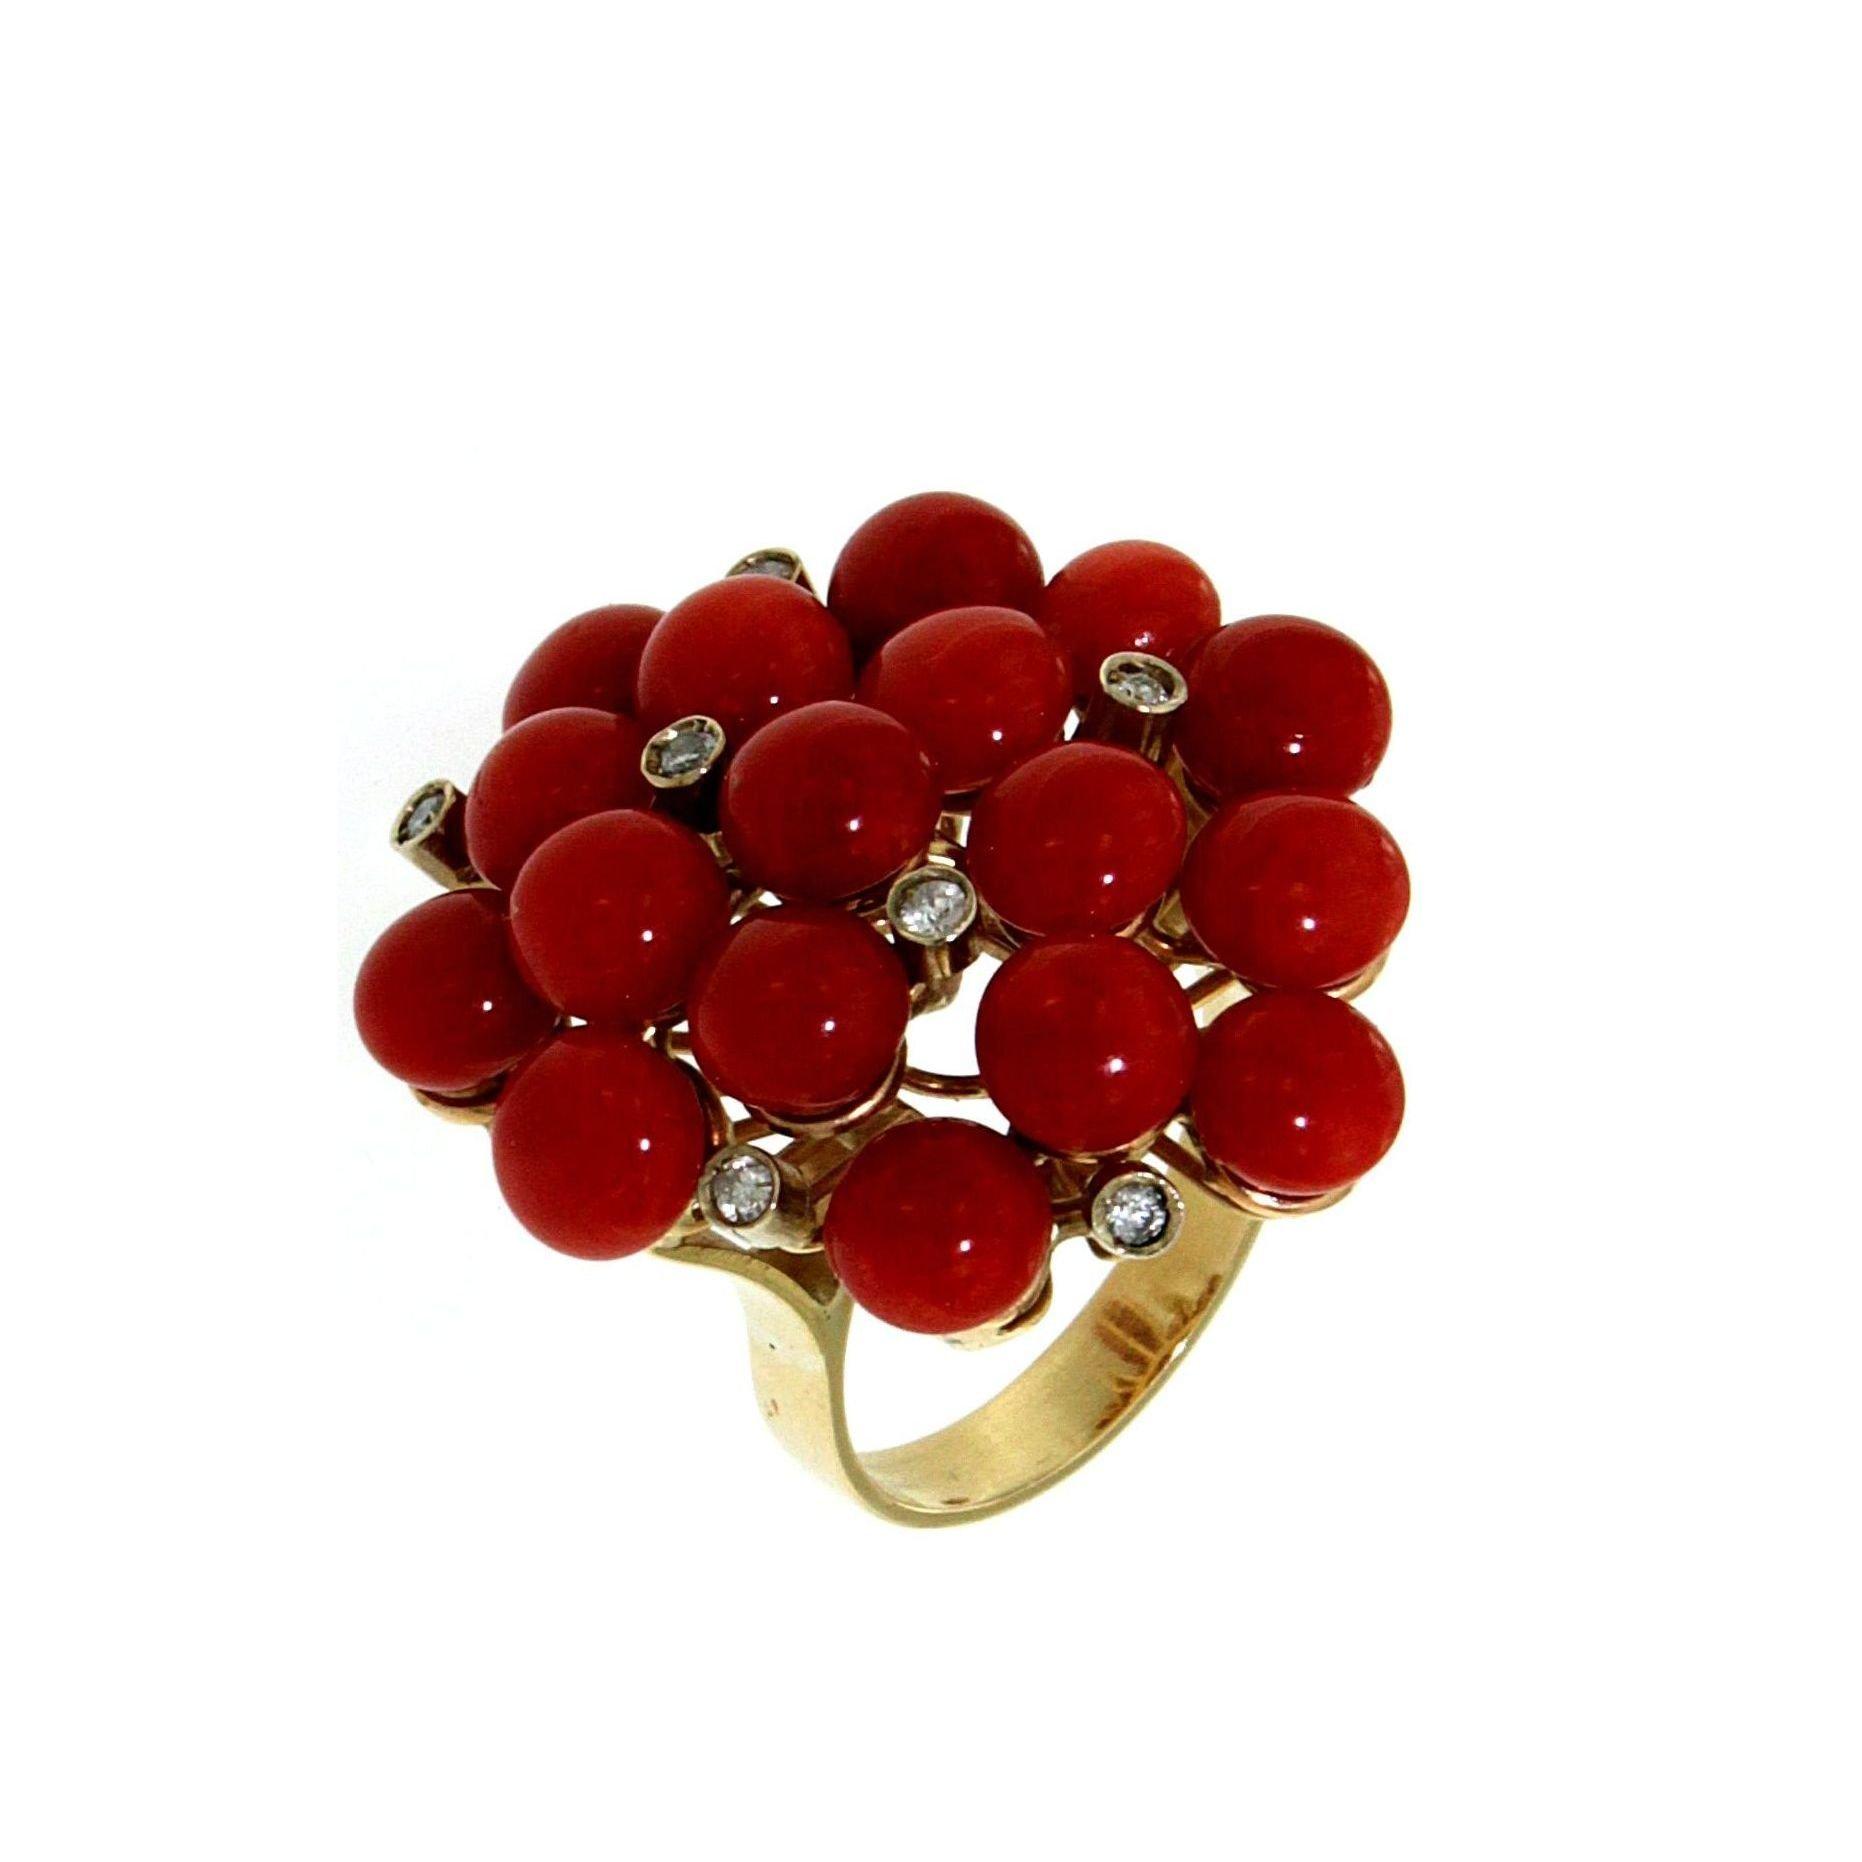 Anello con corallo sardo e diamanti